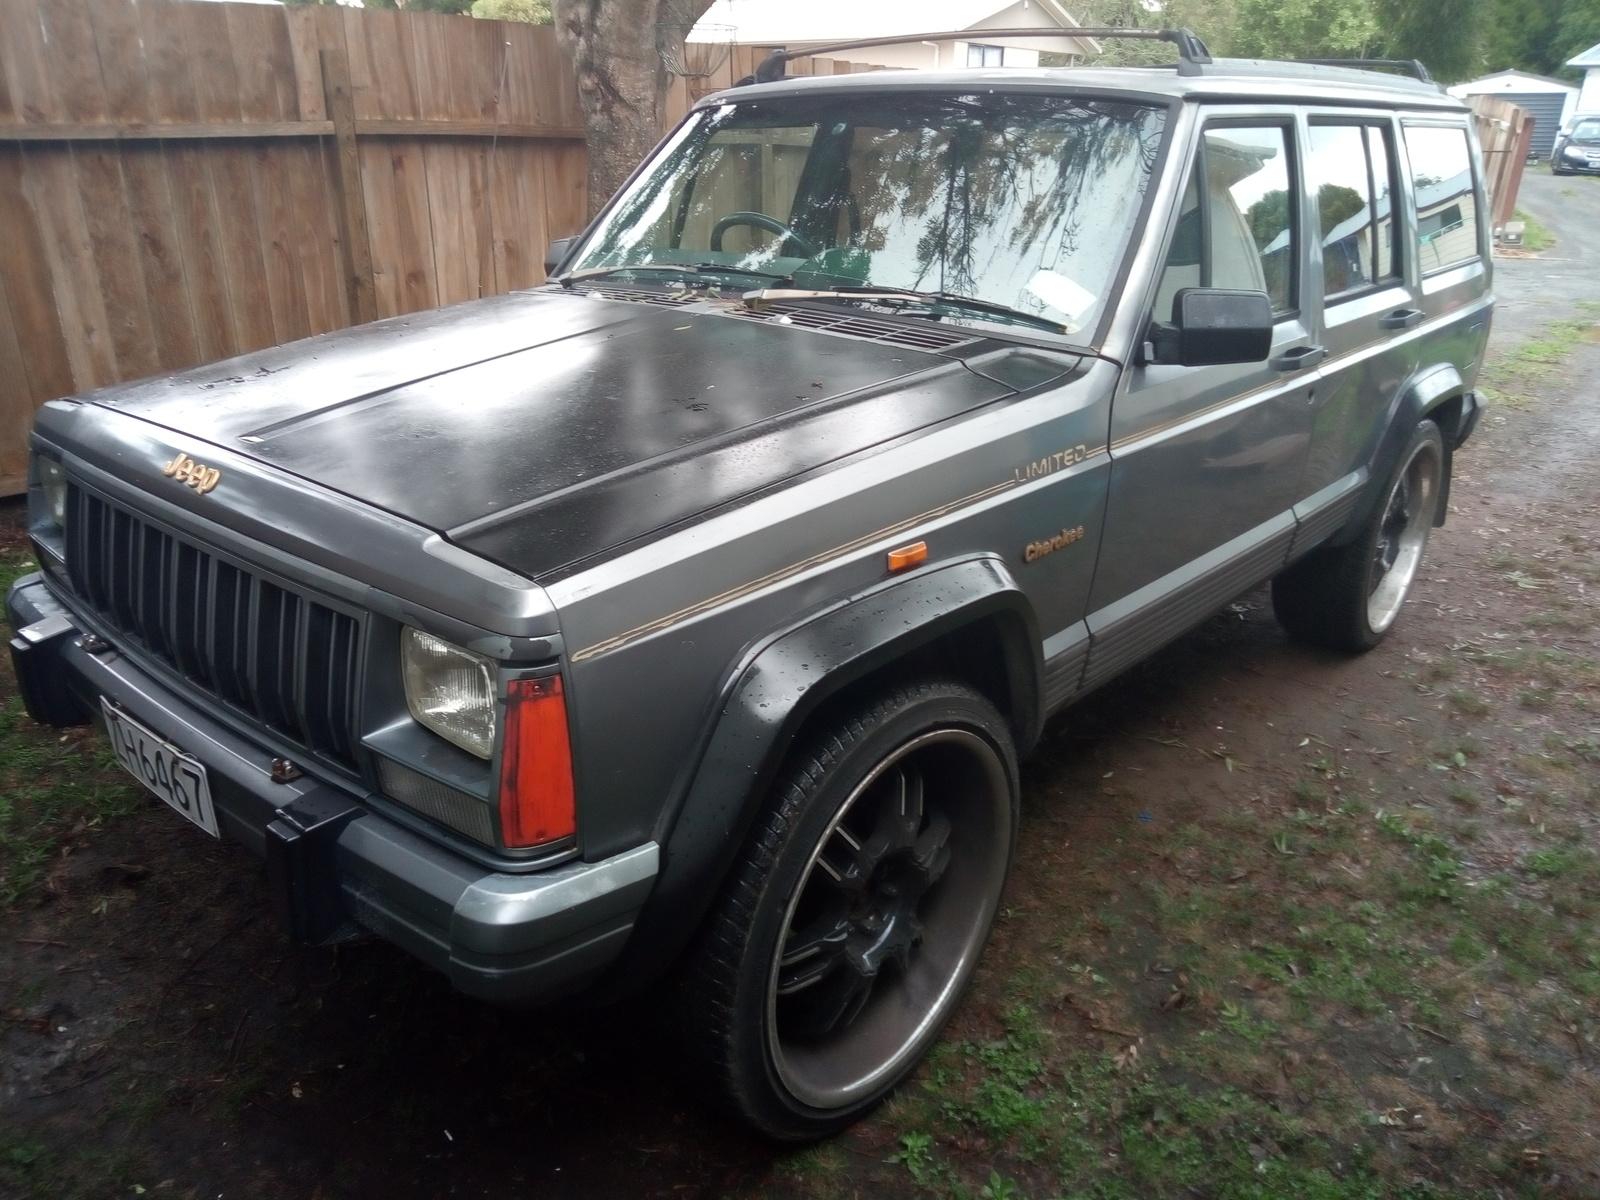 Jeep Cherokee Questions 1993 Jeep Cherokee Full Beam Works Parking Lights Work But Headlight Cargurus